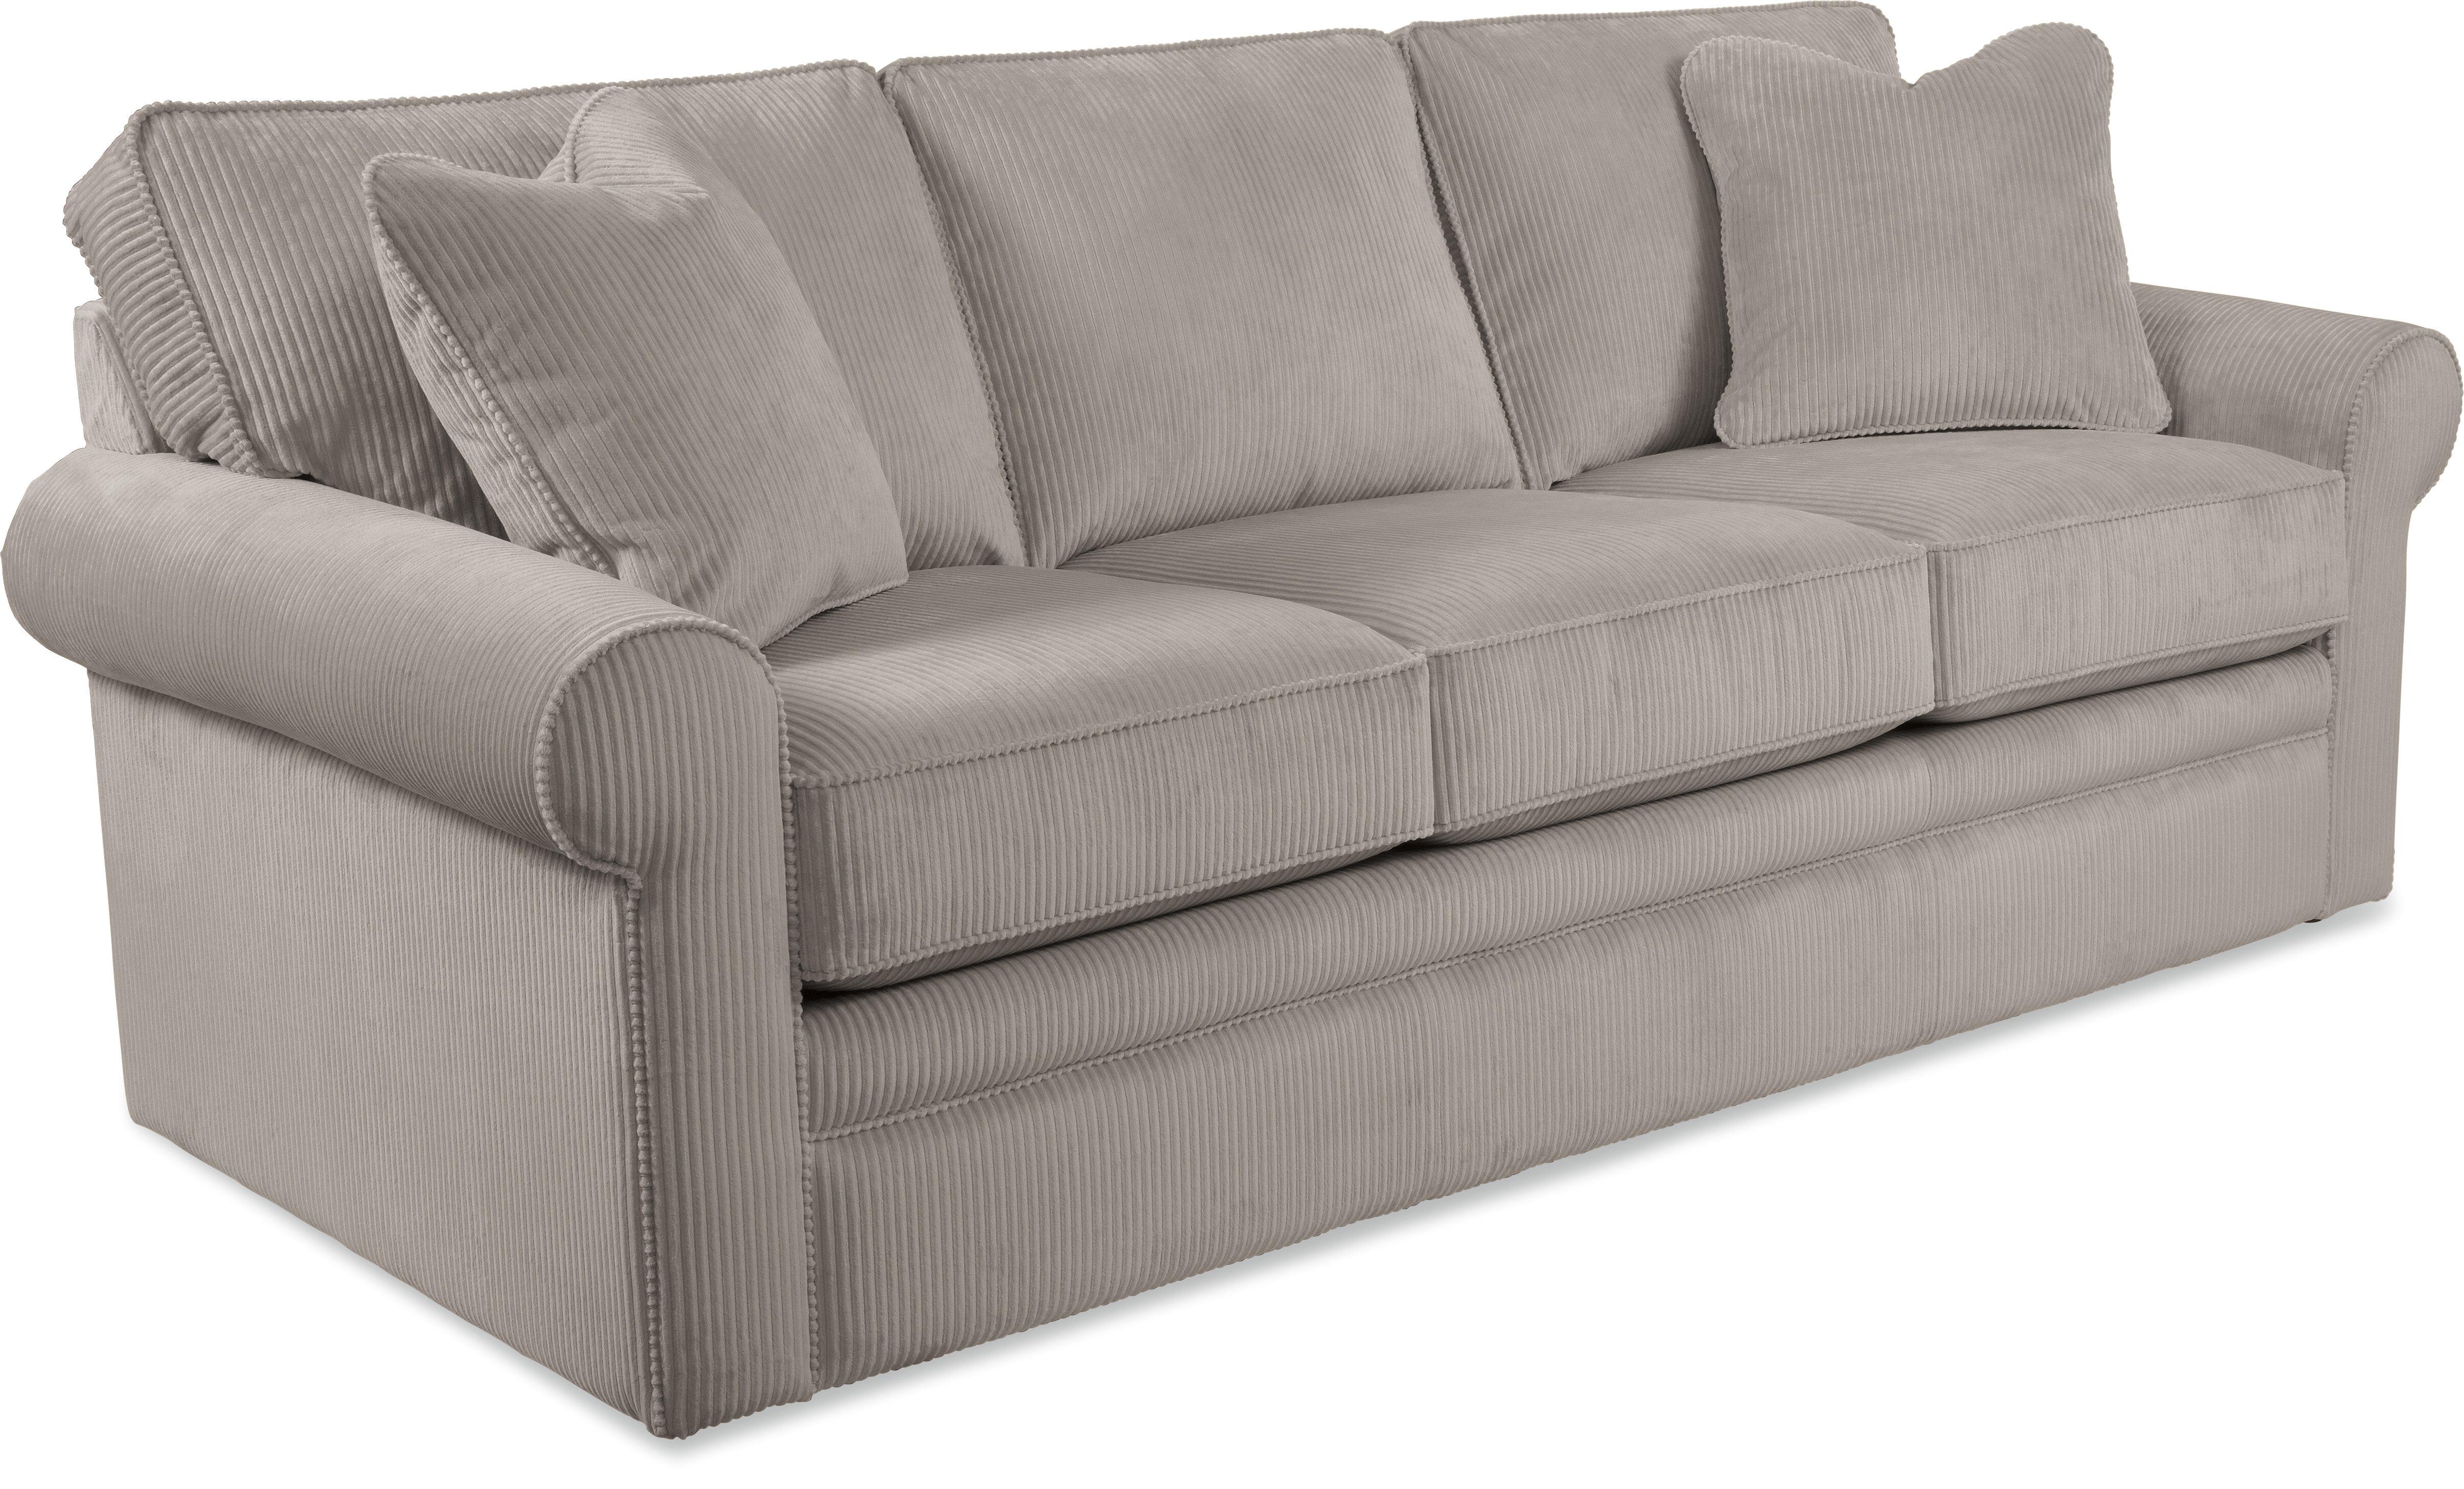 Genial La Z Boy Collins Premier Sofa U0026 Reviews | Wayfair